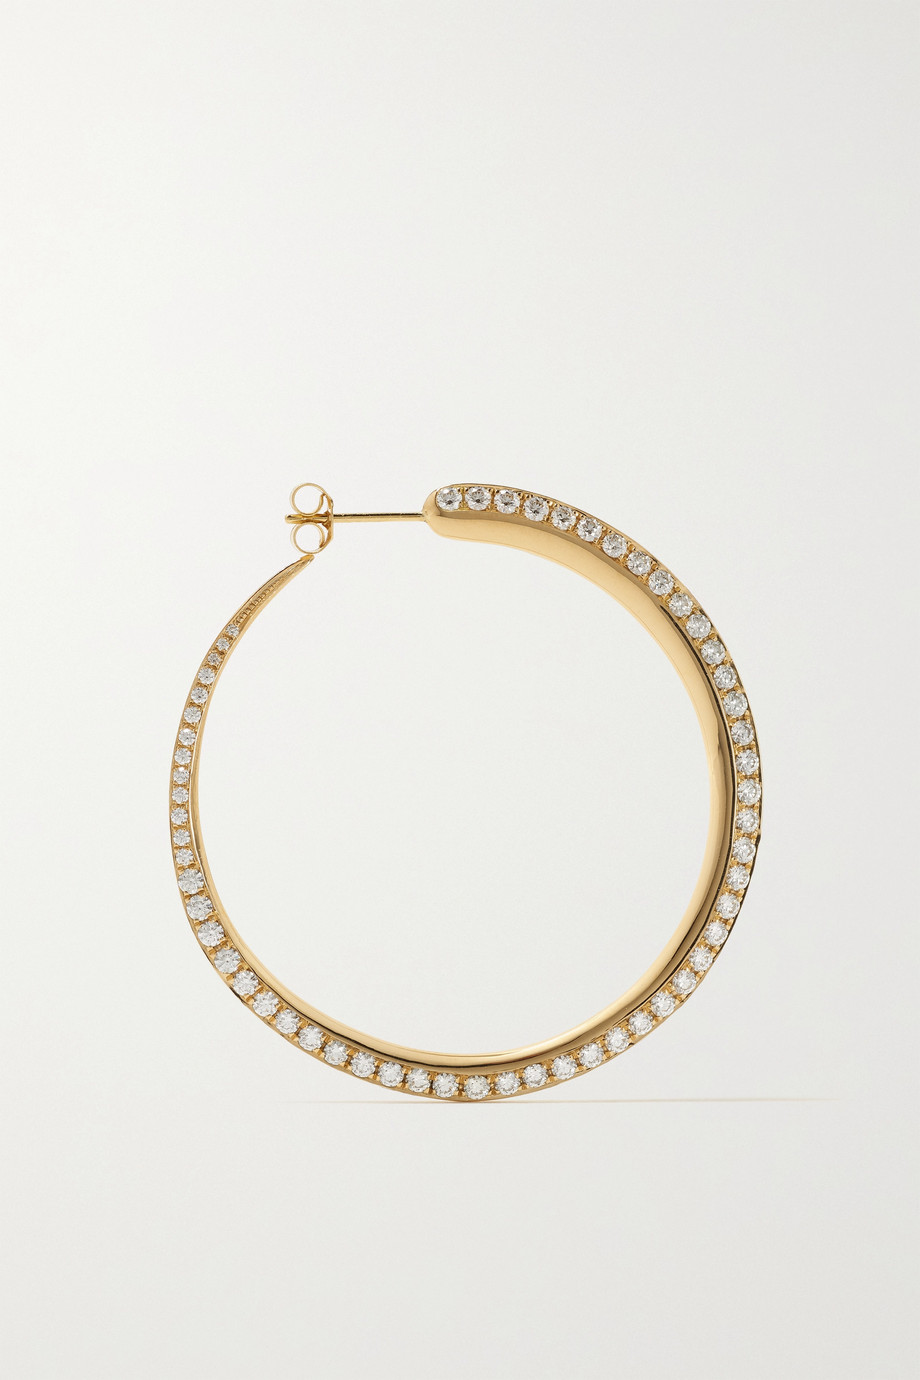 KHIRY Fine Tiniest Khartoum 18-karat gold diamond hoop earrings